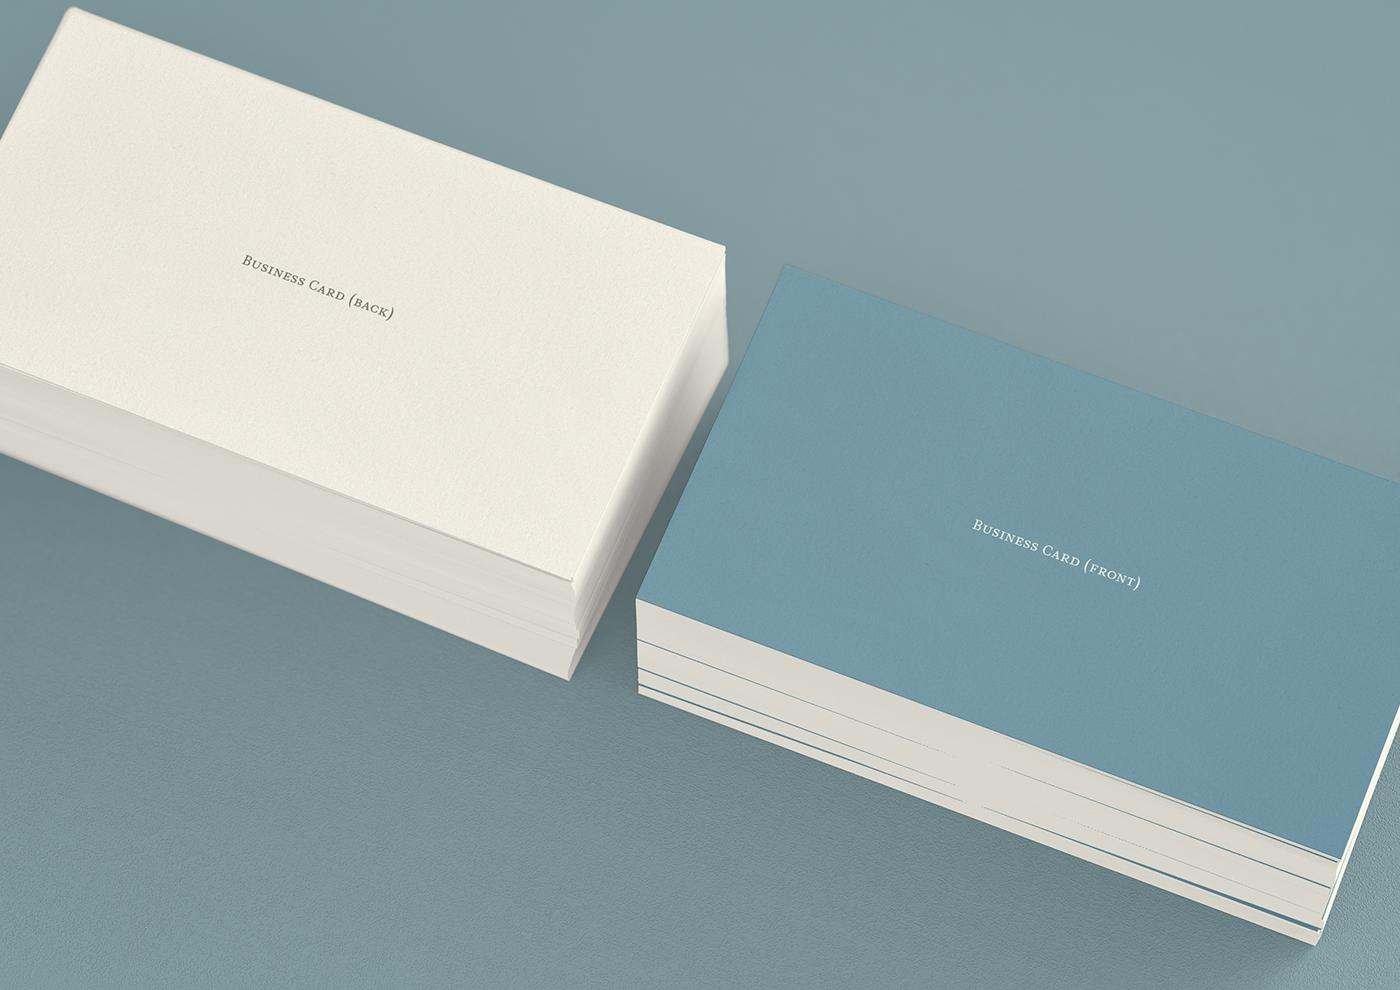 PolarWhite stationery by JHåland - Free Mockup on Behance